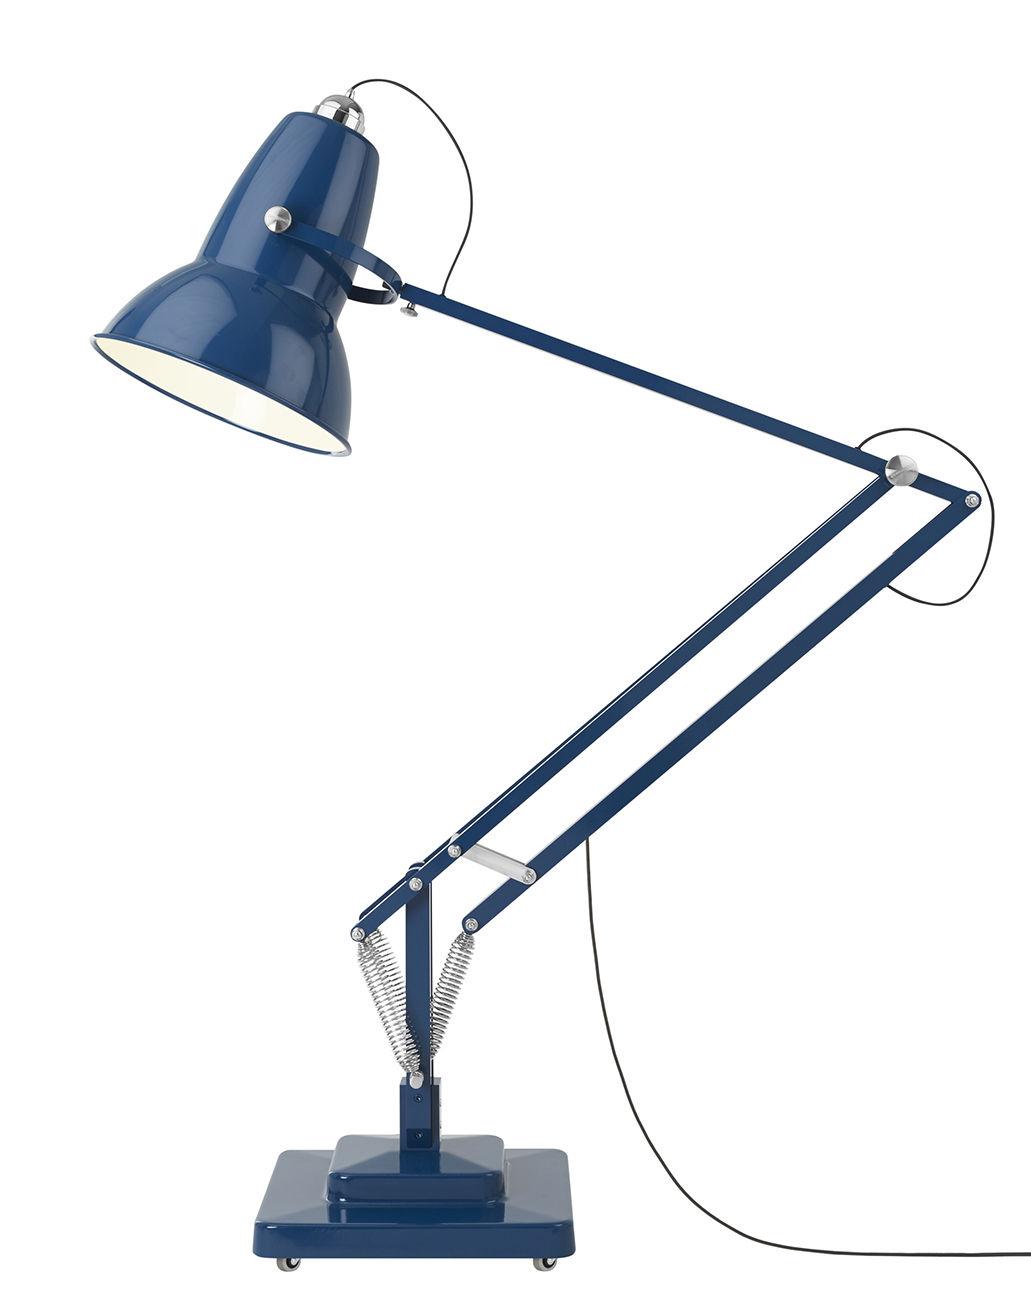 Illuminazione - Lampade da terra - Lampada Original 1227 Giant Outdoor / H 270 cm - Anglepoise - Blu Marine - Acciaio, Alluminio, Ghisa